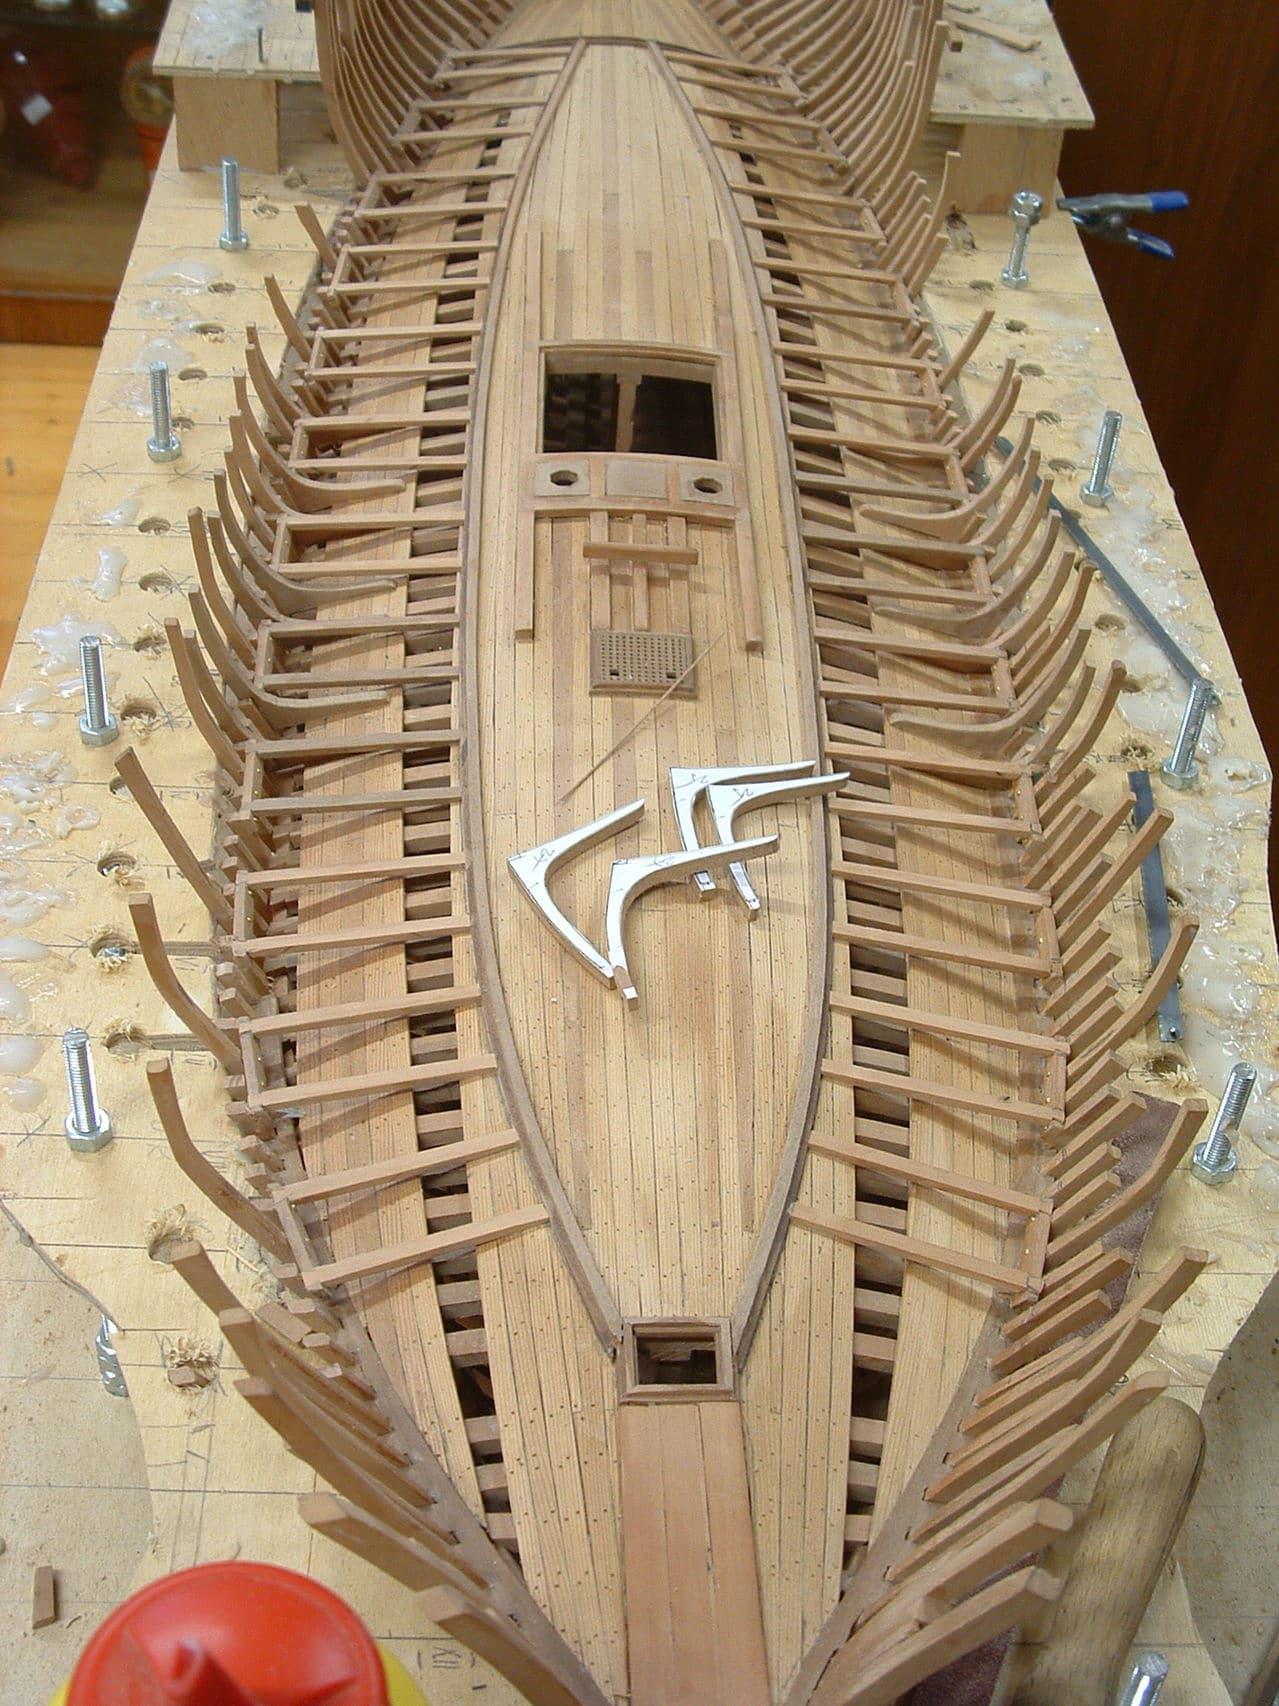 Chebec Le Requin - 1750 1127